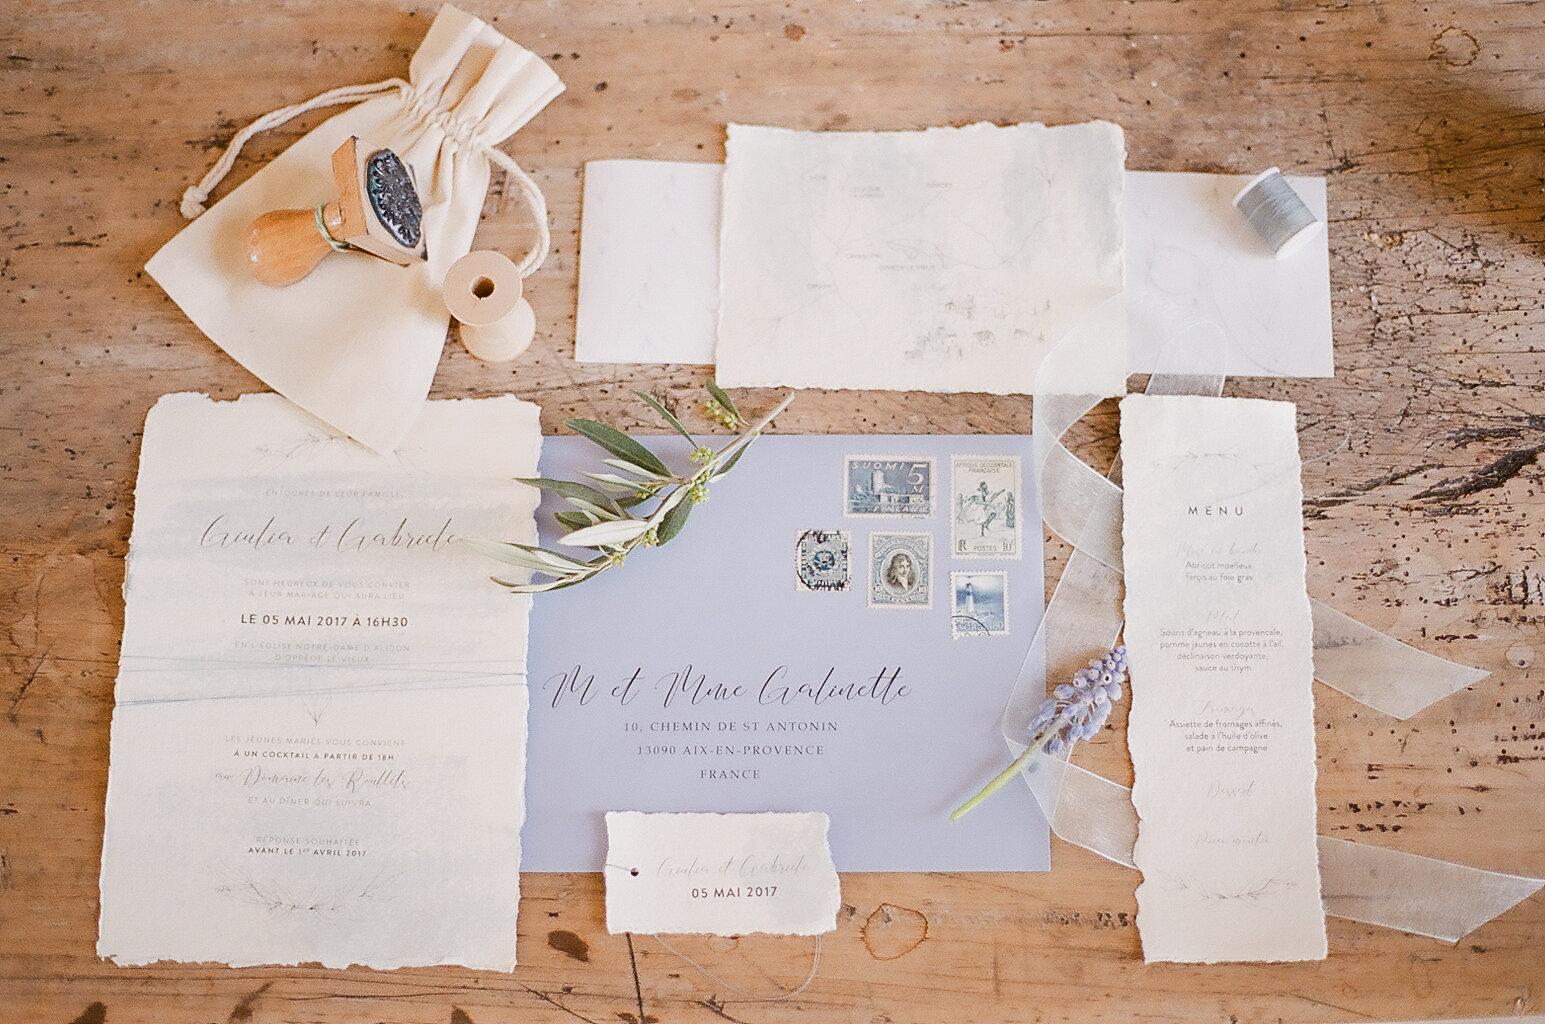 le coeur dans les etoiles - wedding planner - provence - luberon - alpilles - drome - vaucluse - sardaigne - italie - organisation - mariage - shooting - dolce vita - valery villard-144